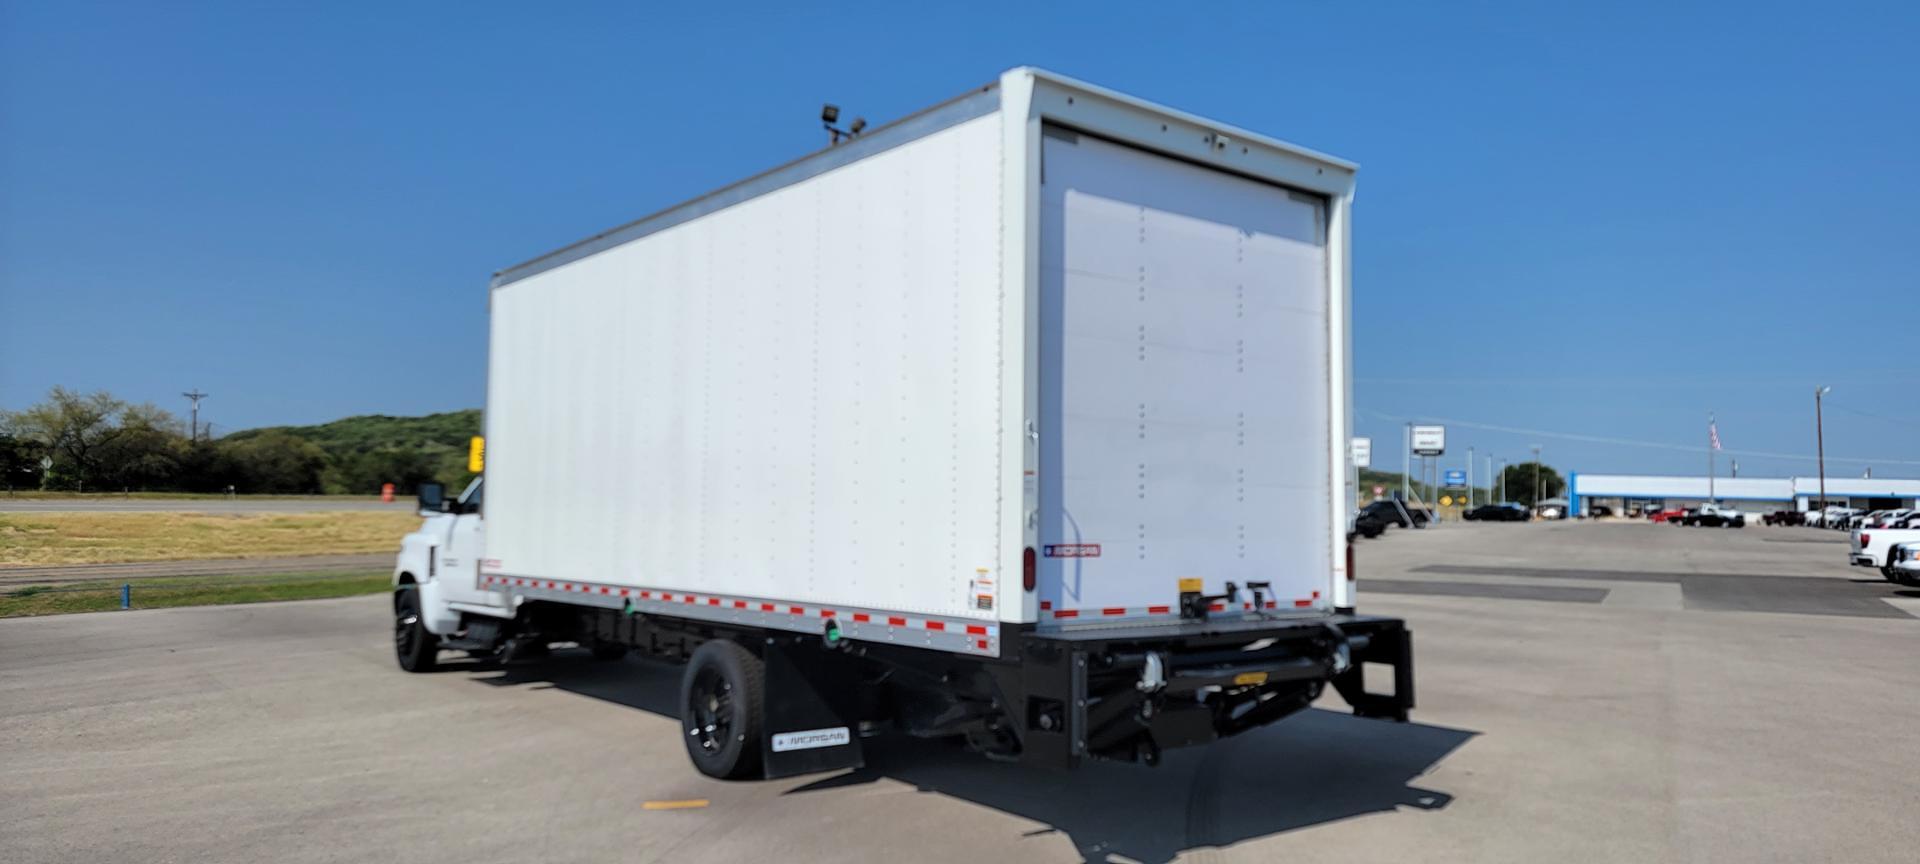 2020 Chevrolet Silverado 6500 Regular Cab DRW 4x2, Morgan Dry Freight #5009400 - photo 1